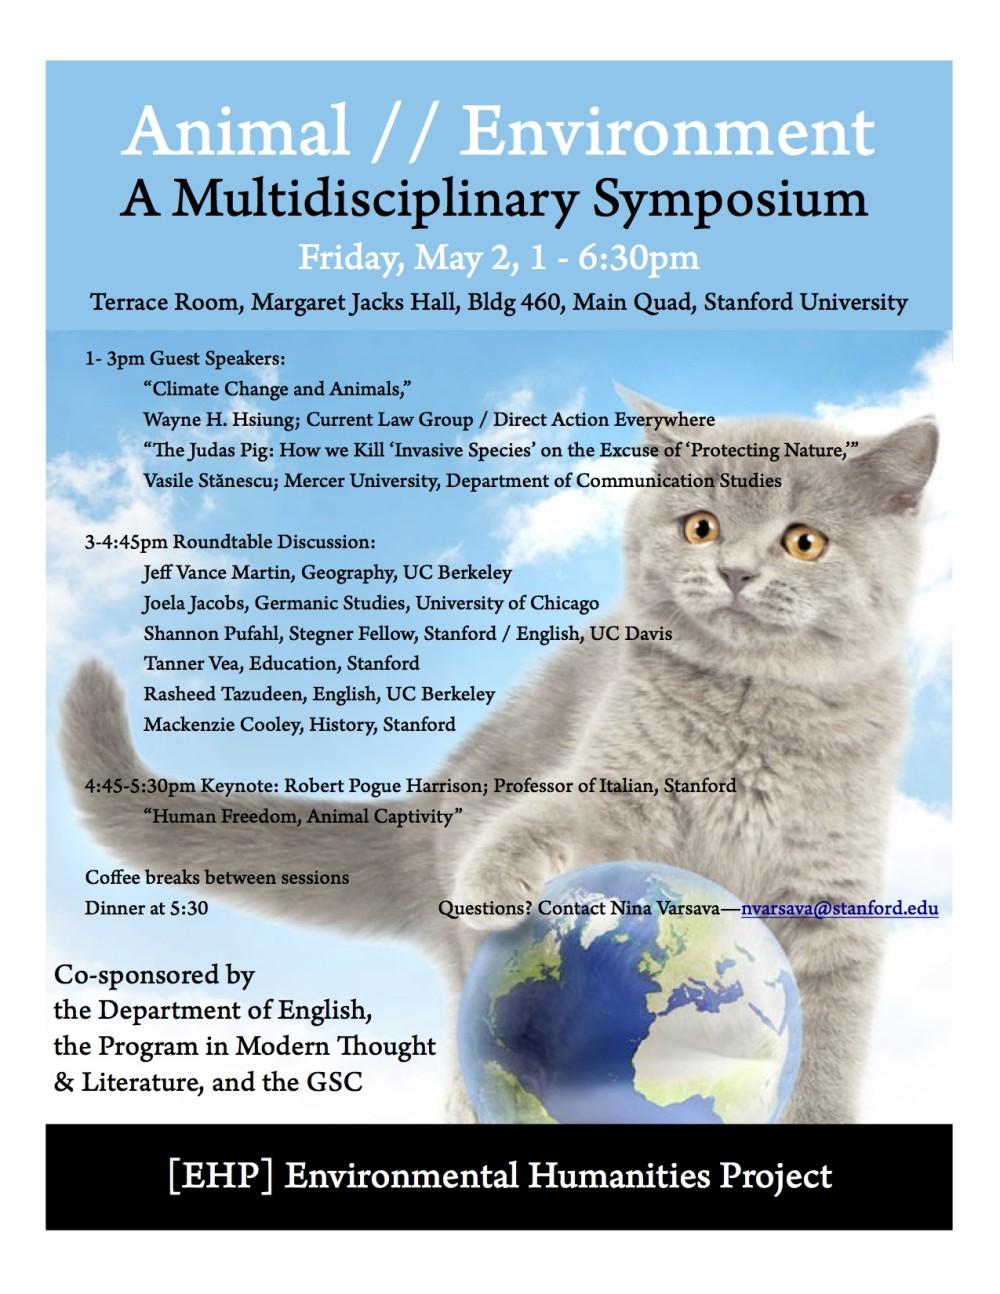 Animal and Environmental Studies Symposium